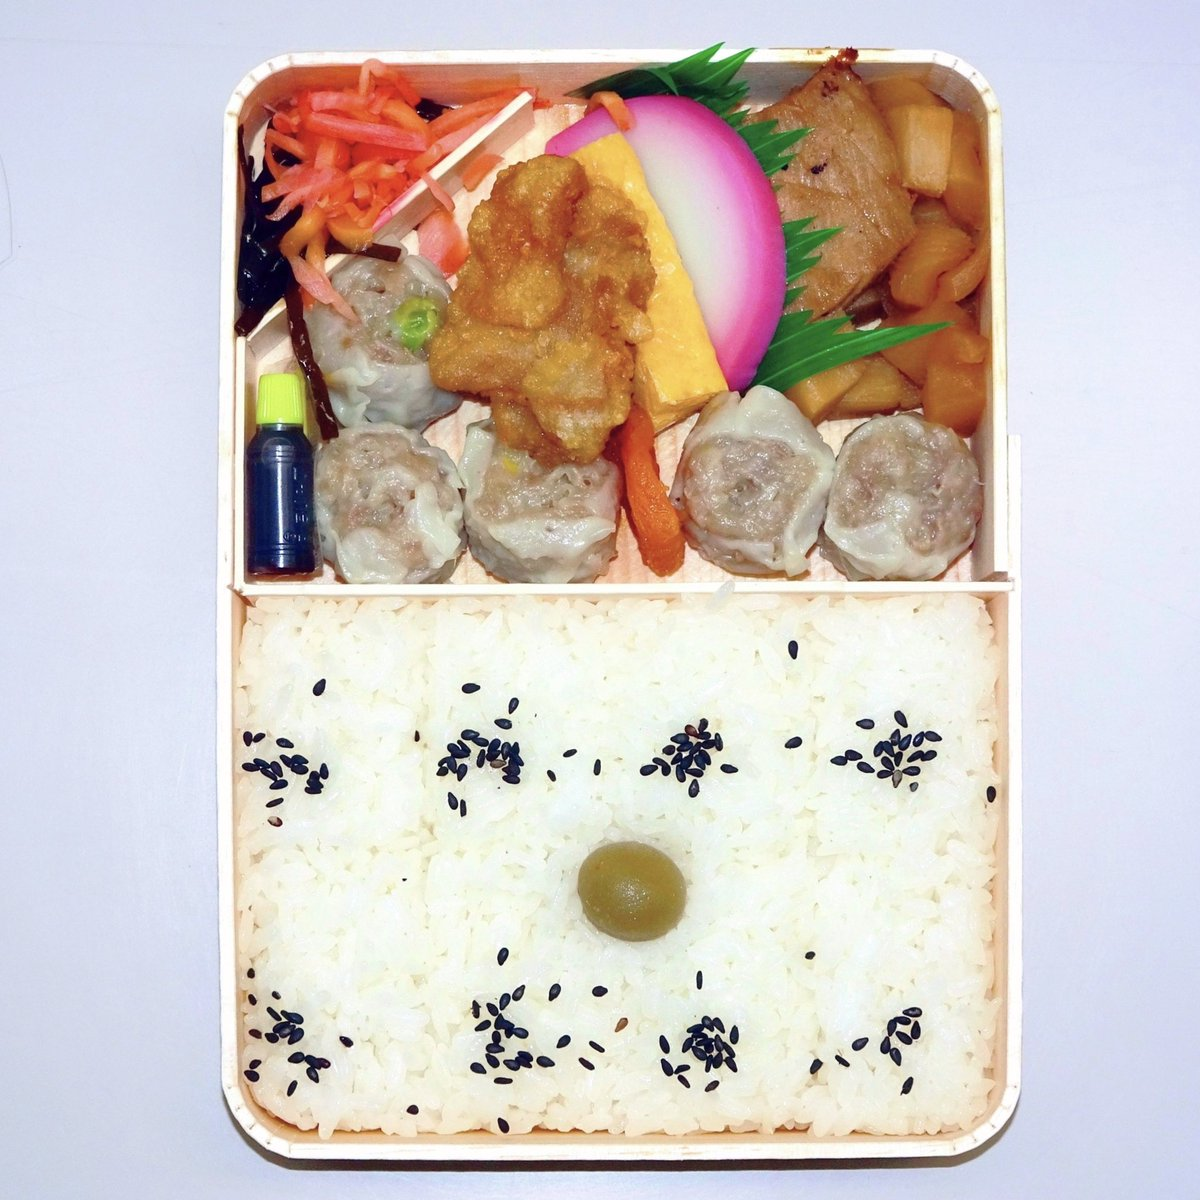 test ツイッターメディア - #崎陽軒  今日の昼ごはんはシウマイ弁当。 https://t.co/cljNUDKpV3